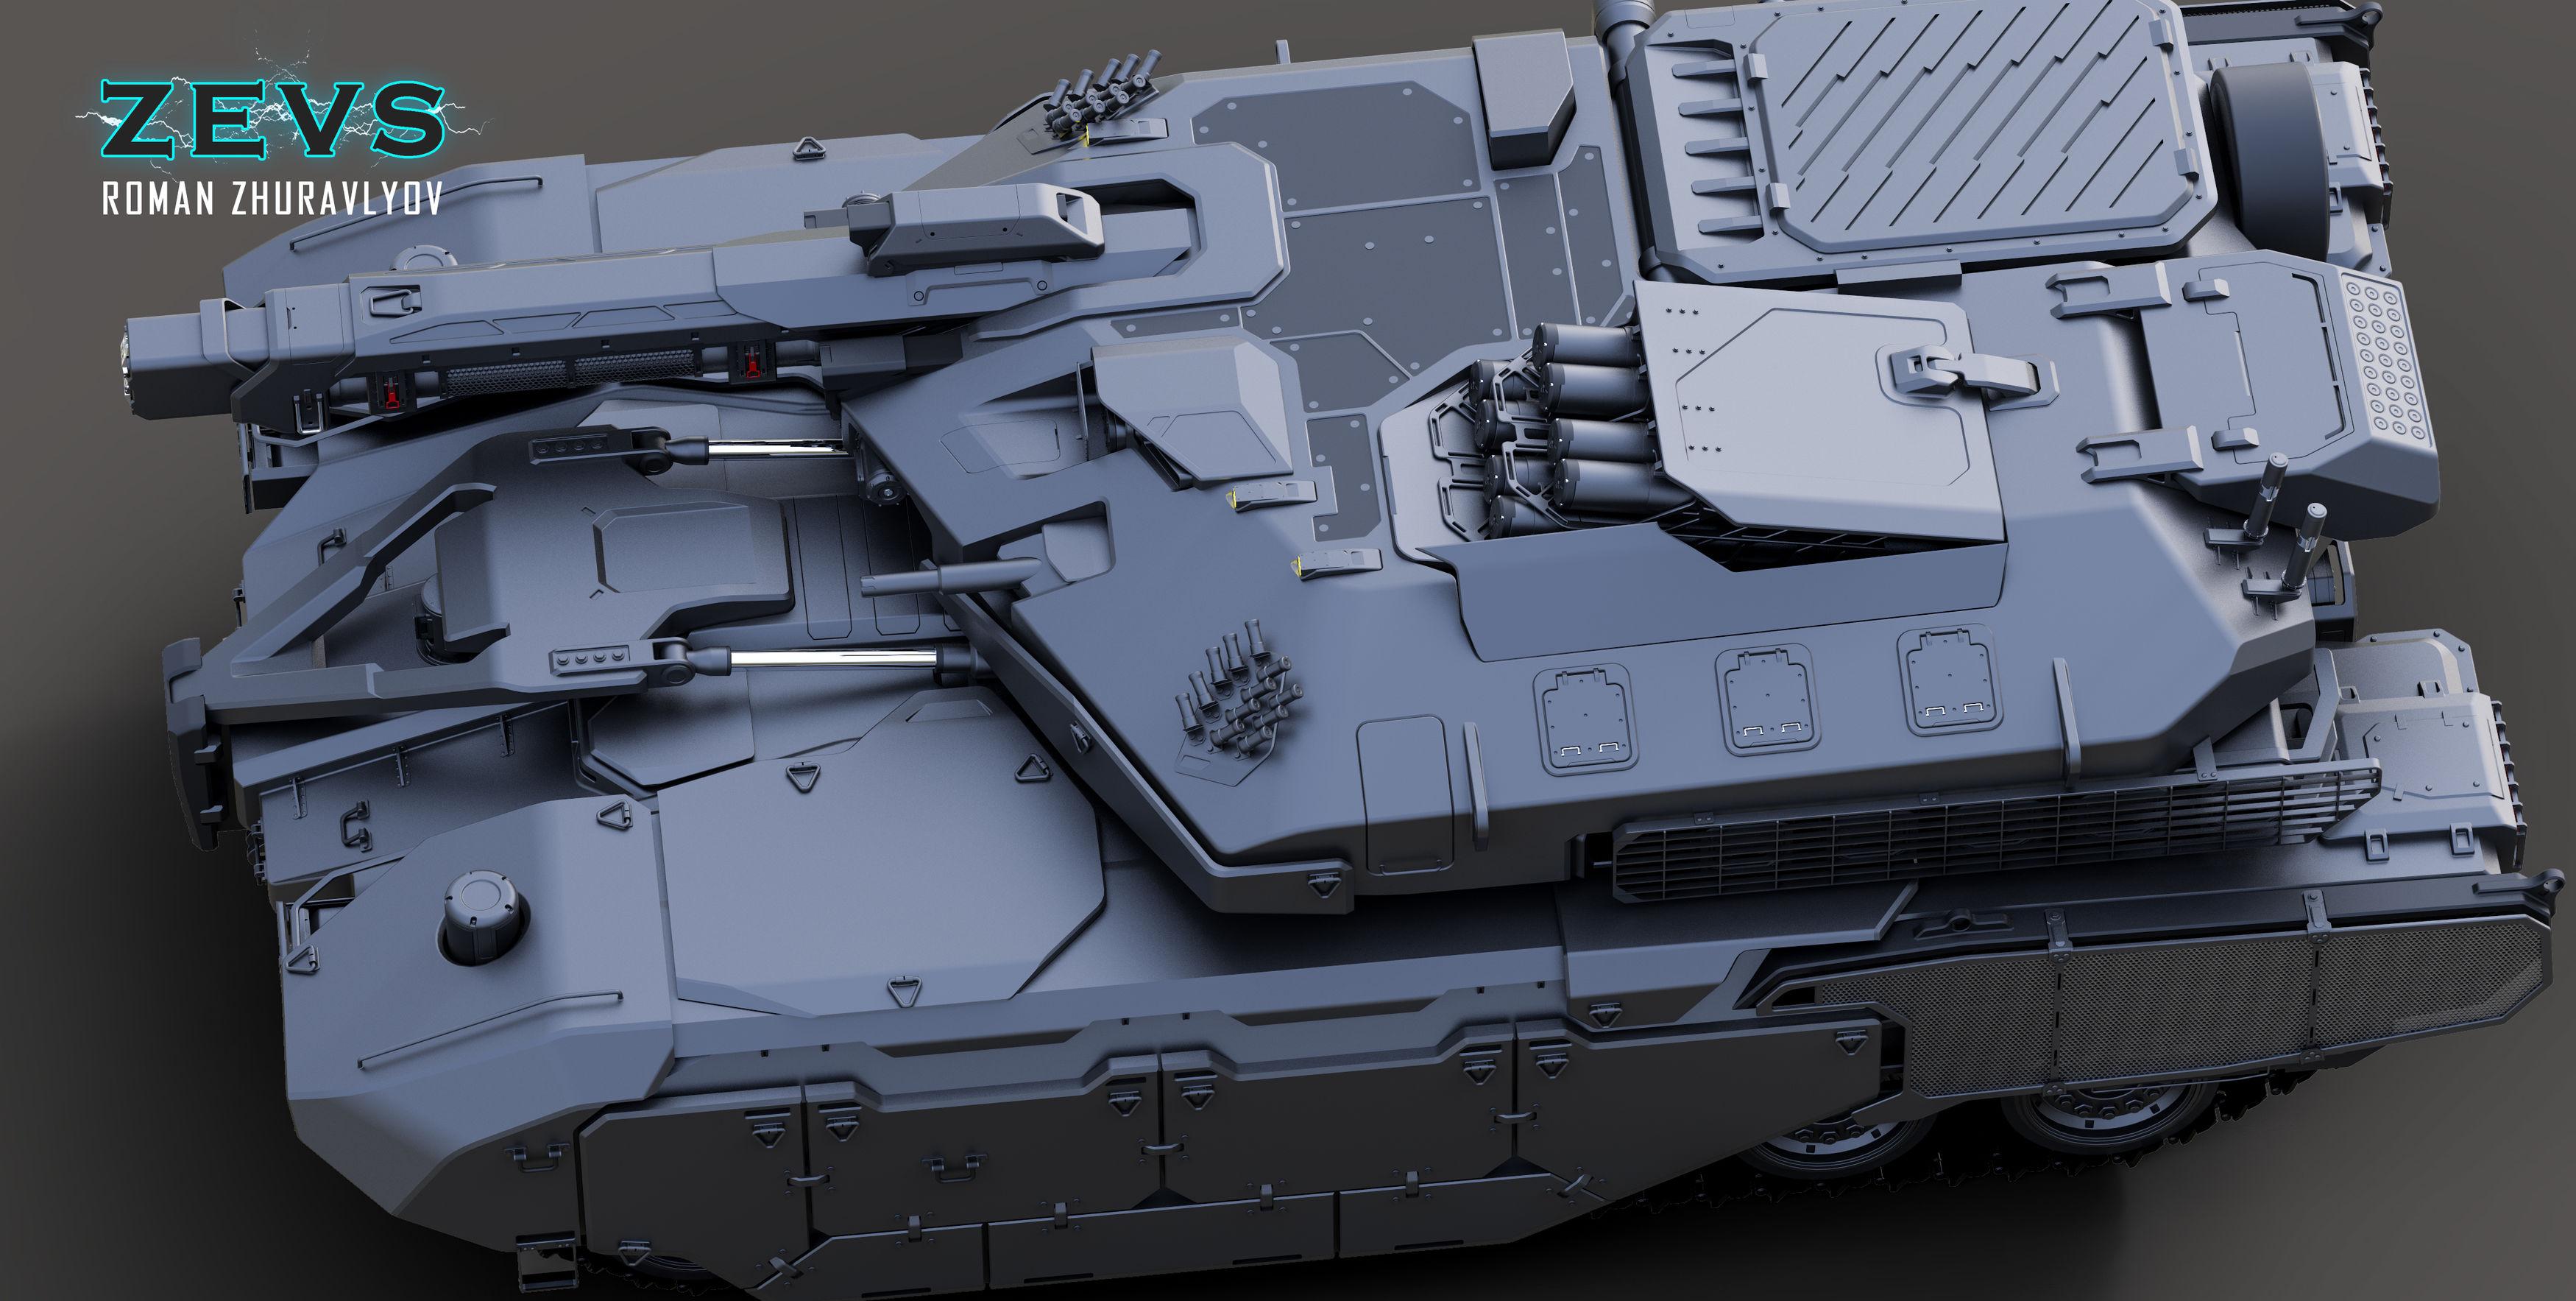 Tank-zevs-4-1-3500-3500